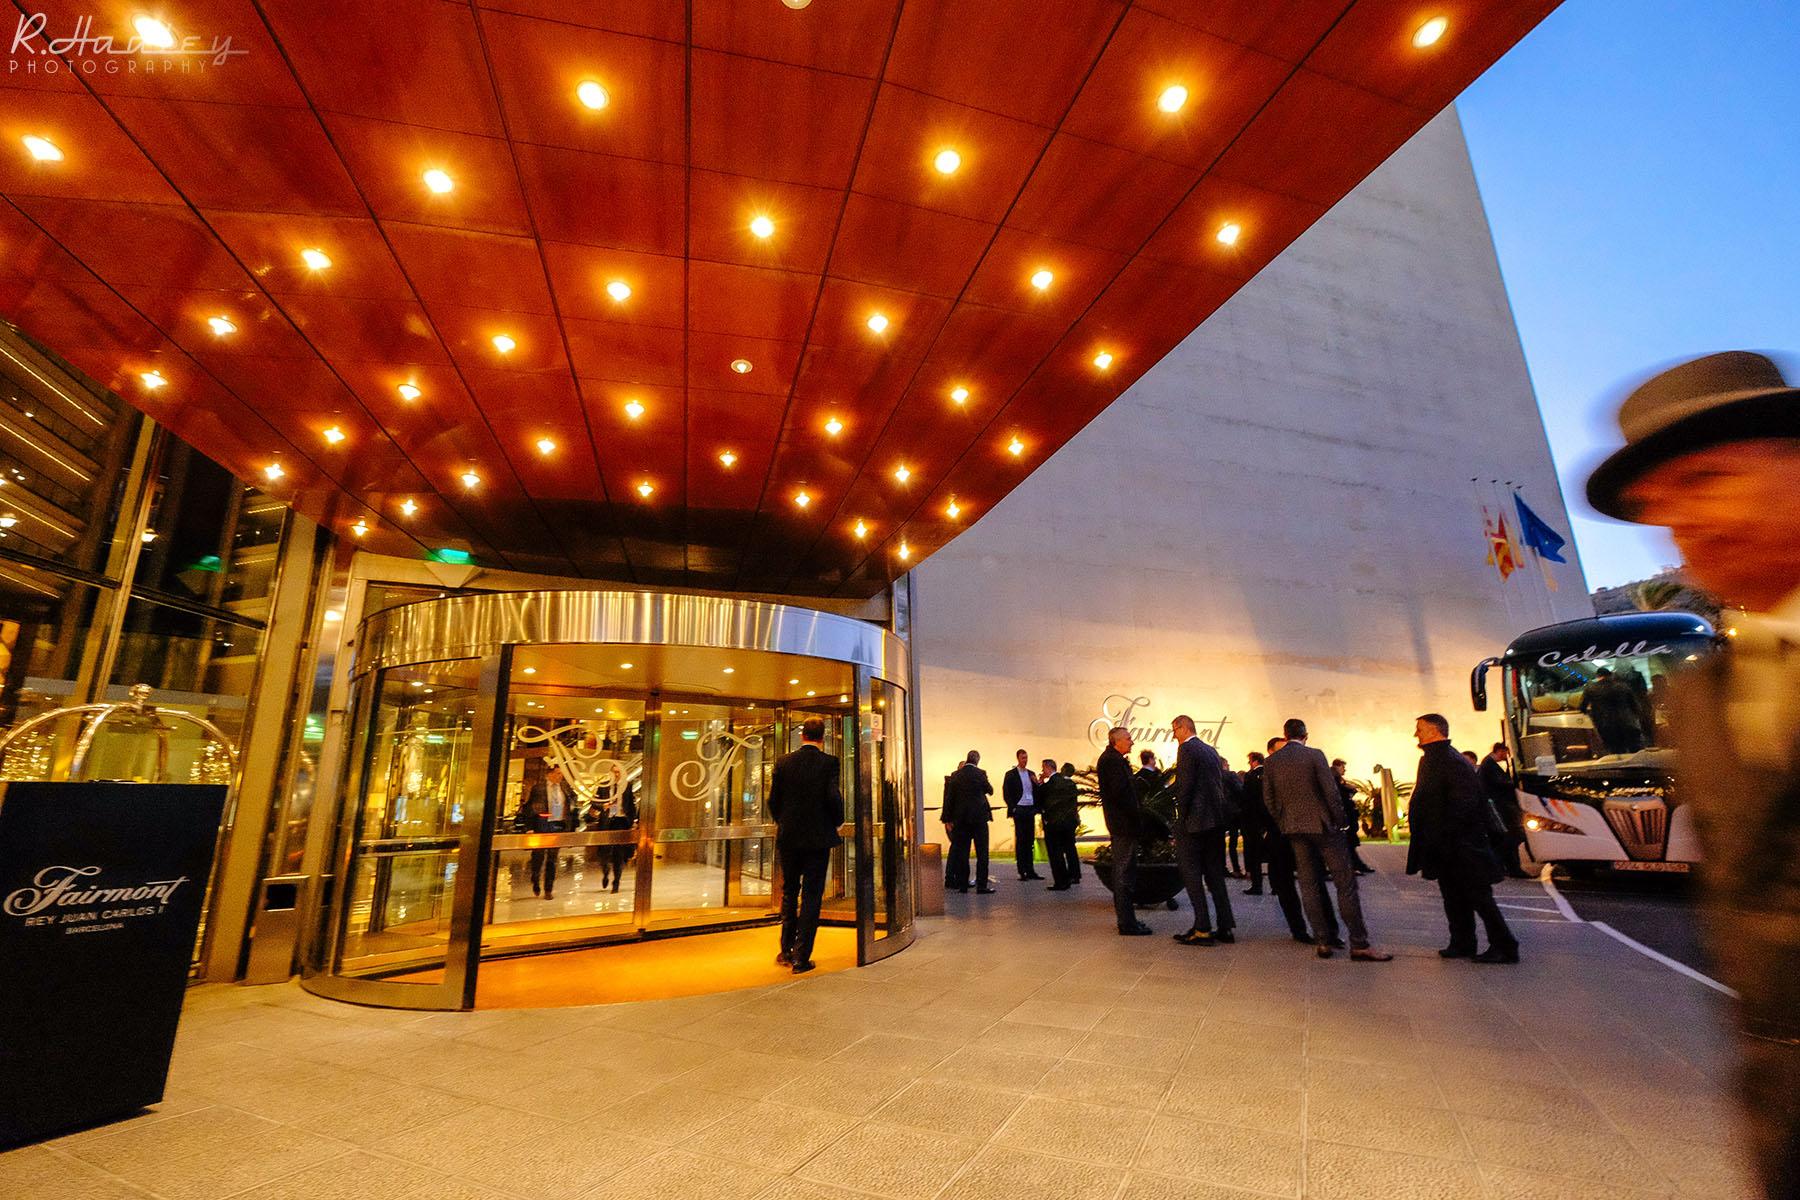 Event | Fairmont Rey Juan Carlos Hotel & Camp Nou | Barcelona